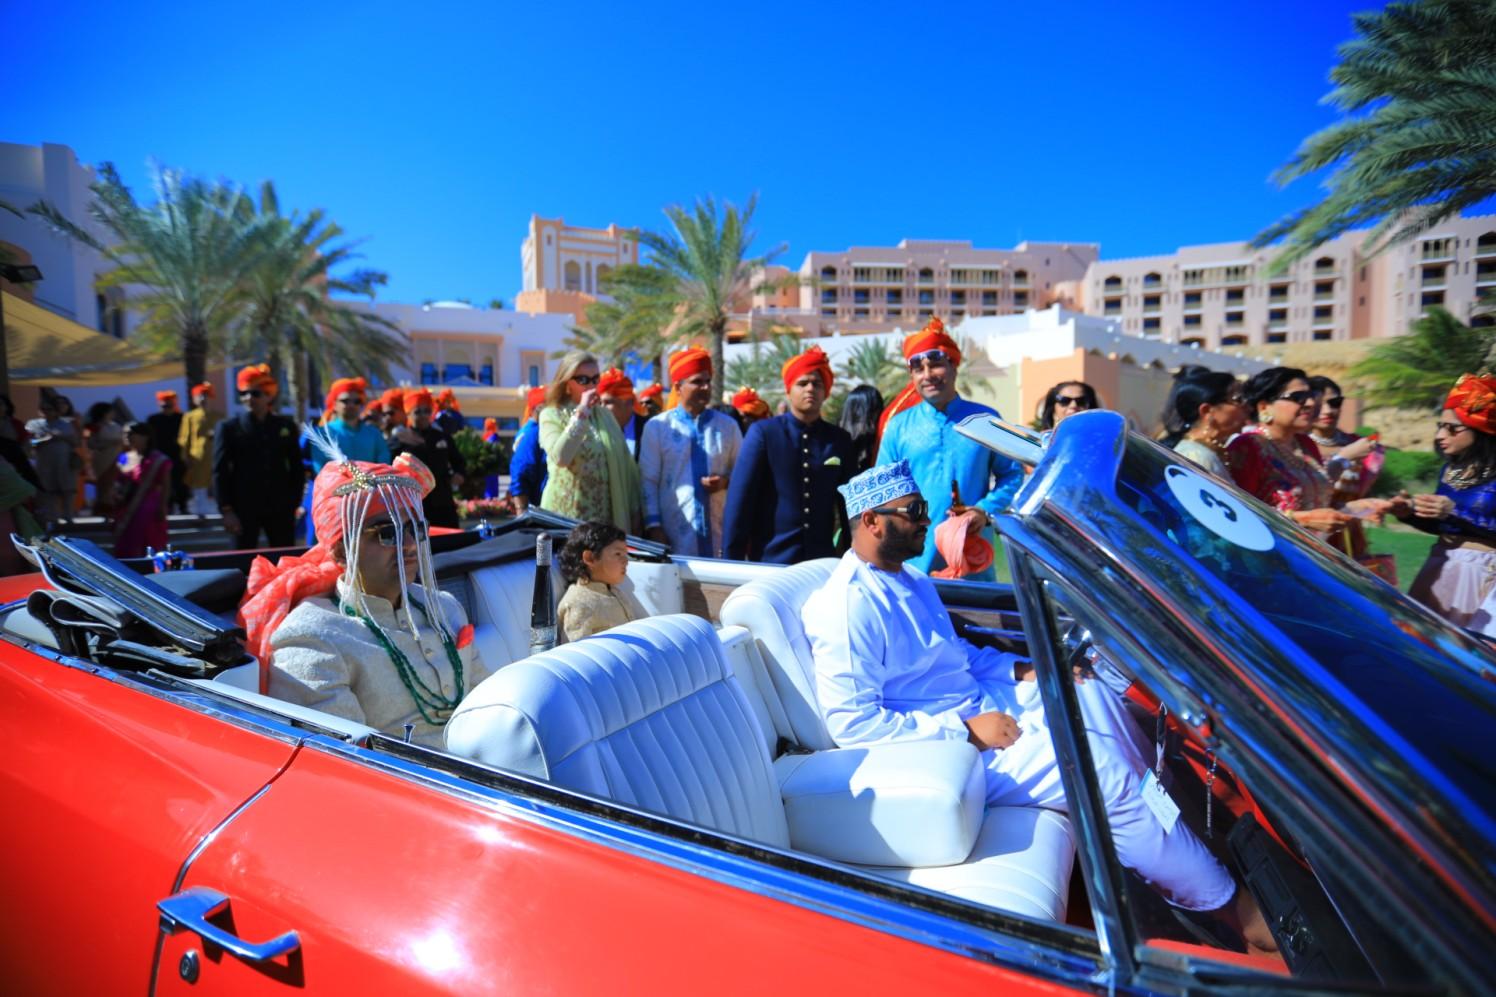 Groom Arriving in a Lavish Car For an Exotic Beach Side Wedding by Amit Kumar Wedding-photography | Weddings Photos & Ideas